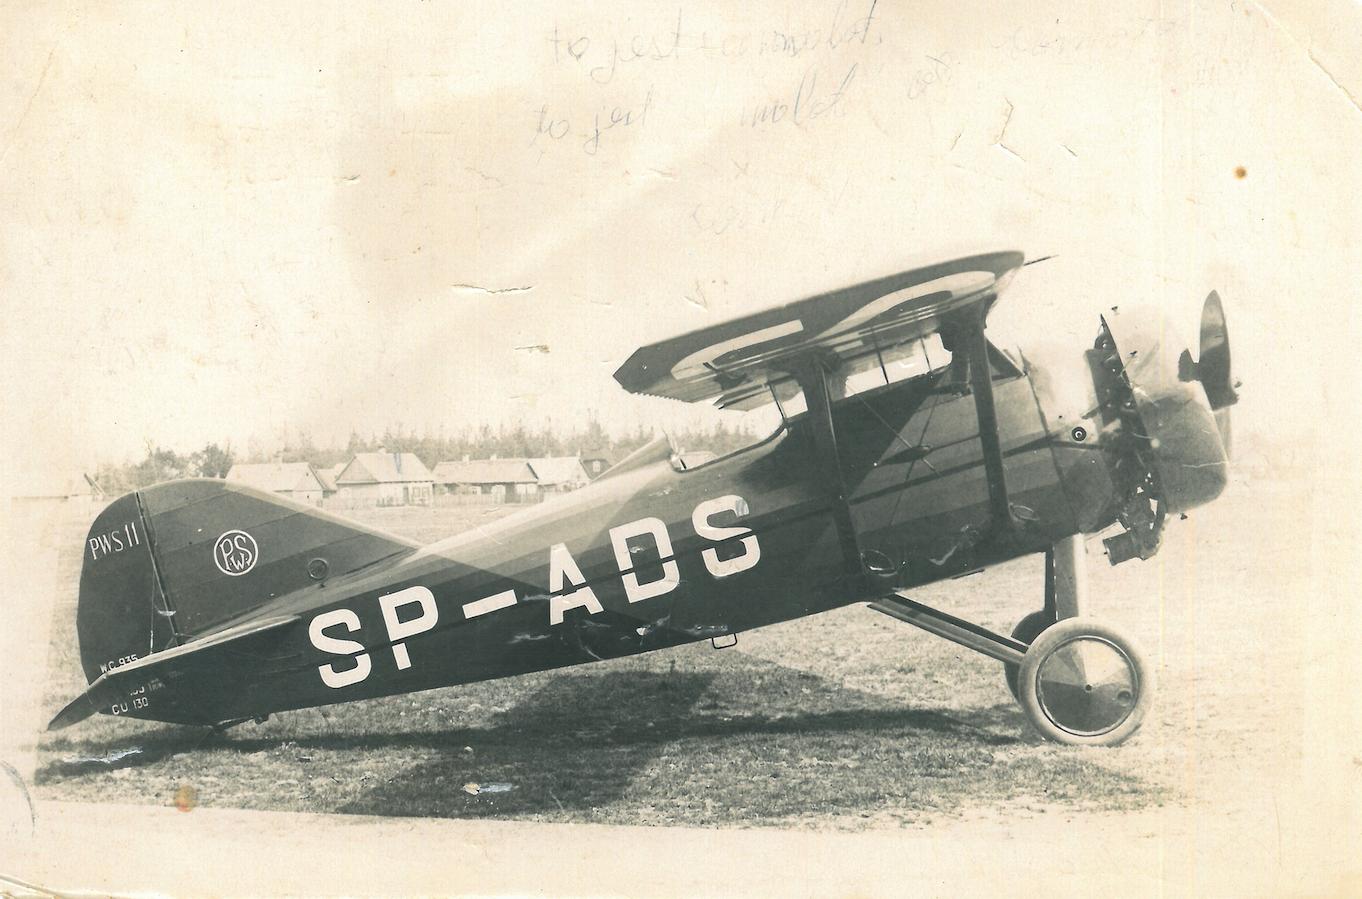 PWS-11. Photo from the family album of Mr.Kuba Cichosz